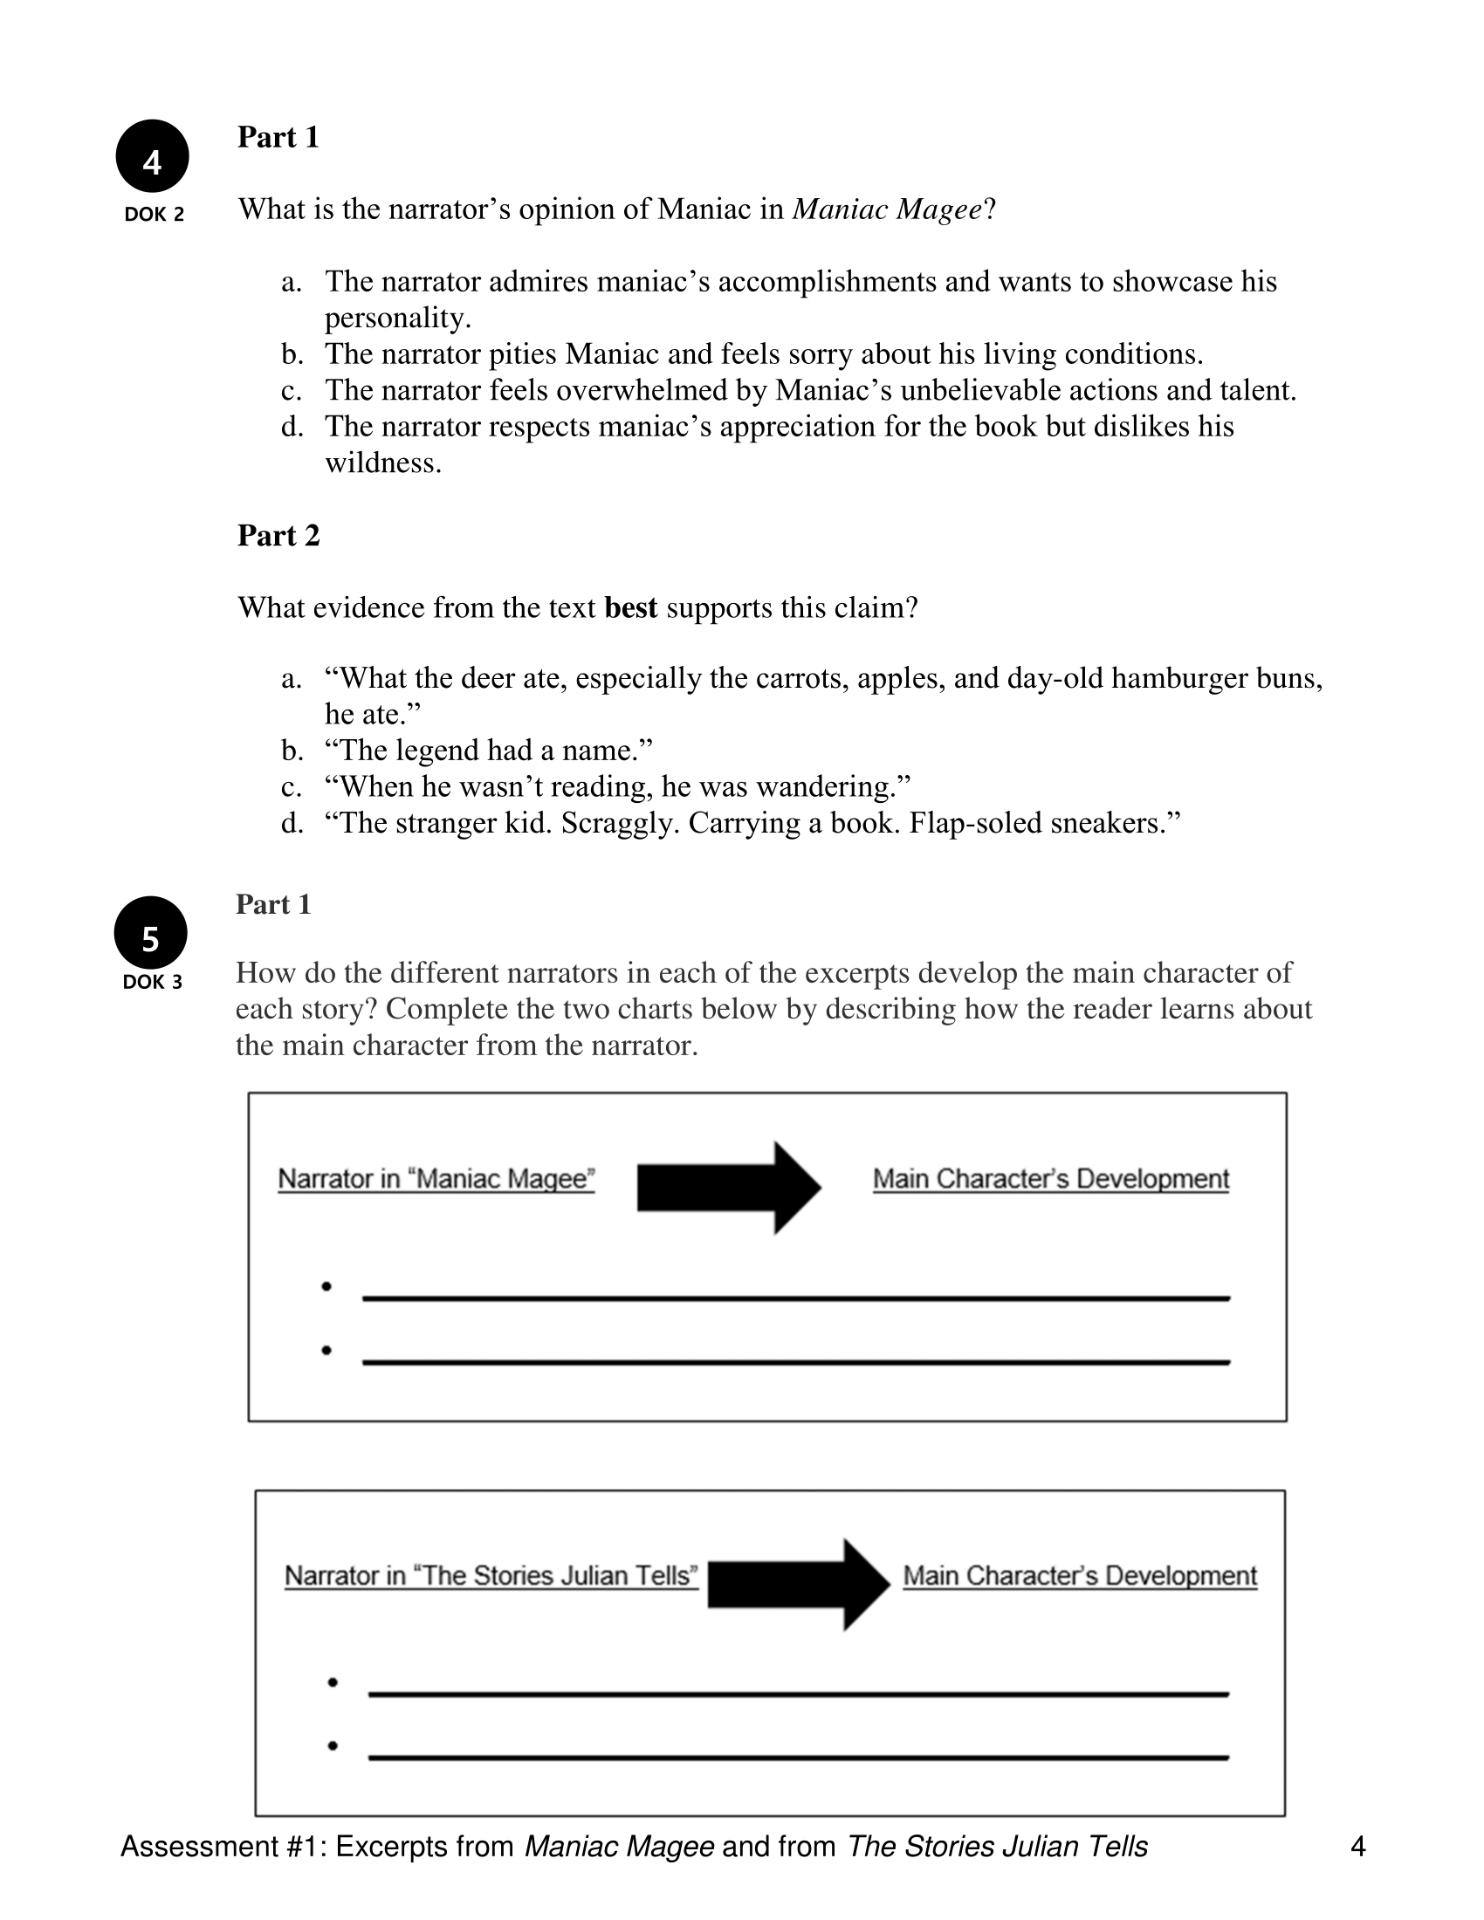 worksheet The Stories Julian Tells Worksheets literature grade 4 goalbook pathways full resource contains